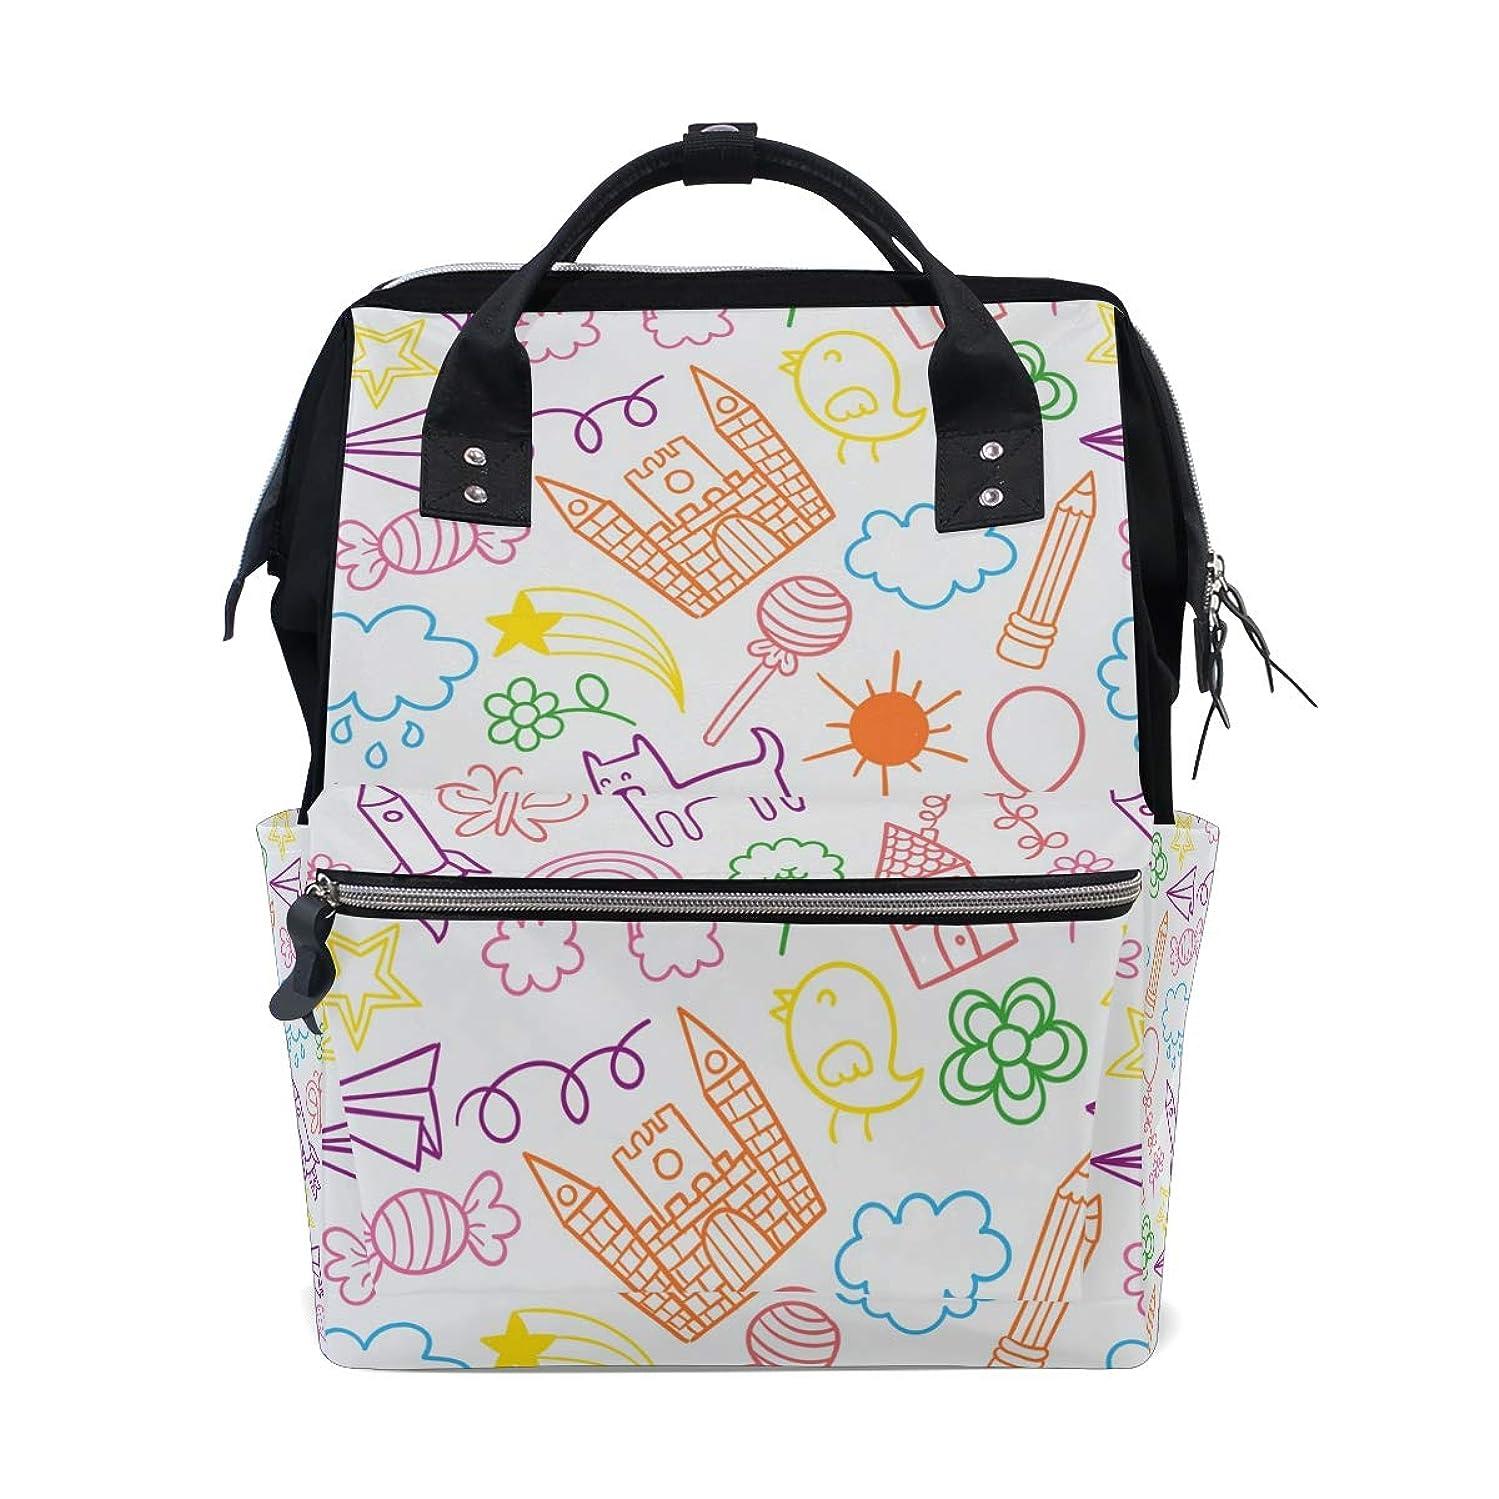 Backpack Children's Cartoon Painting School Rucksack Diaper Bags Travel Shoulder Large Capacity Bookbag for Women Men